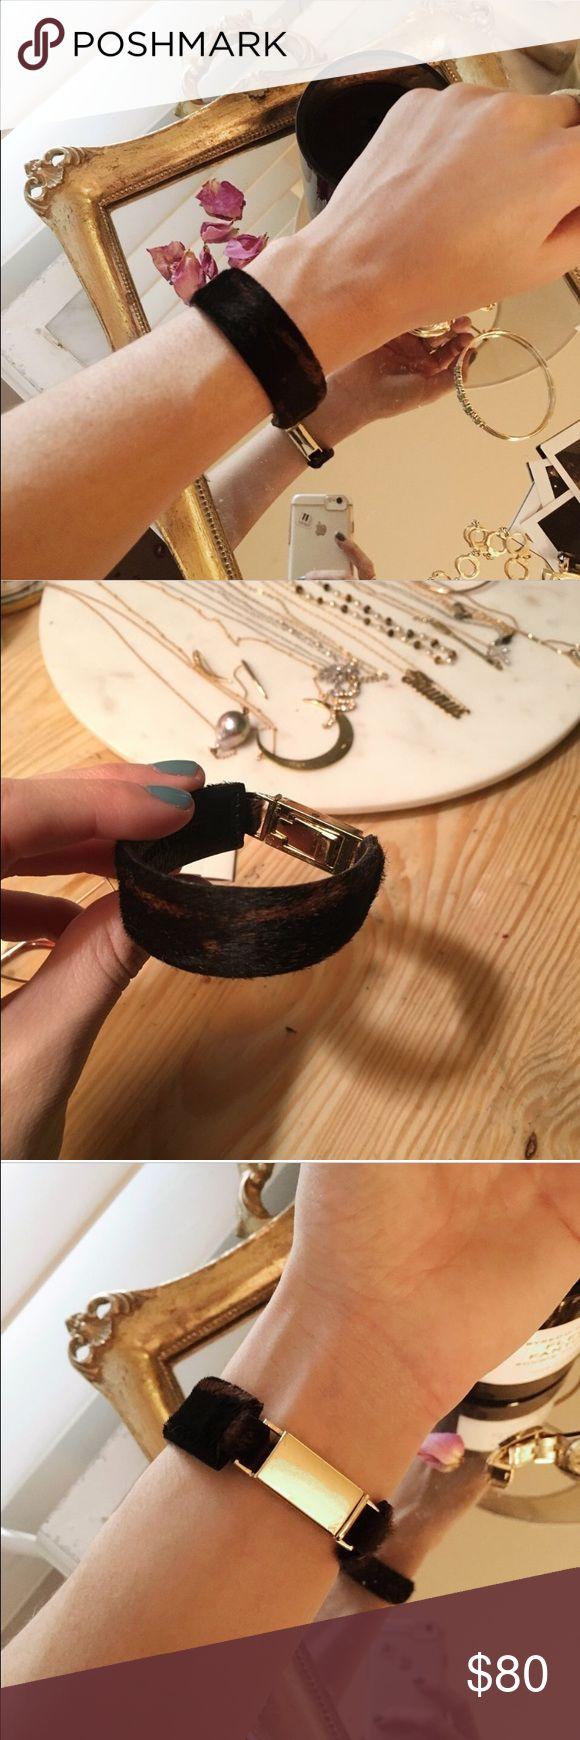 Isabel Marant fur bracelet Worn a few times, great used condition. Isabel Marant Jewelry Bracelets